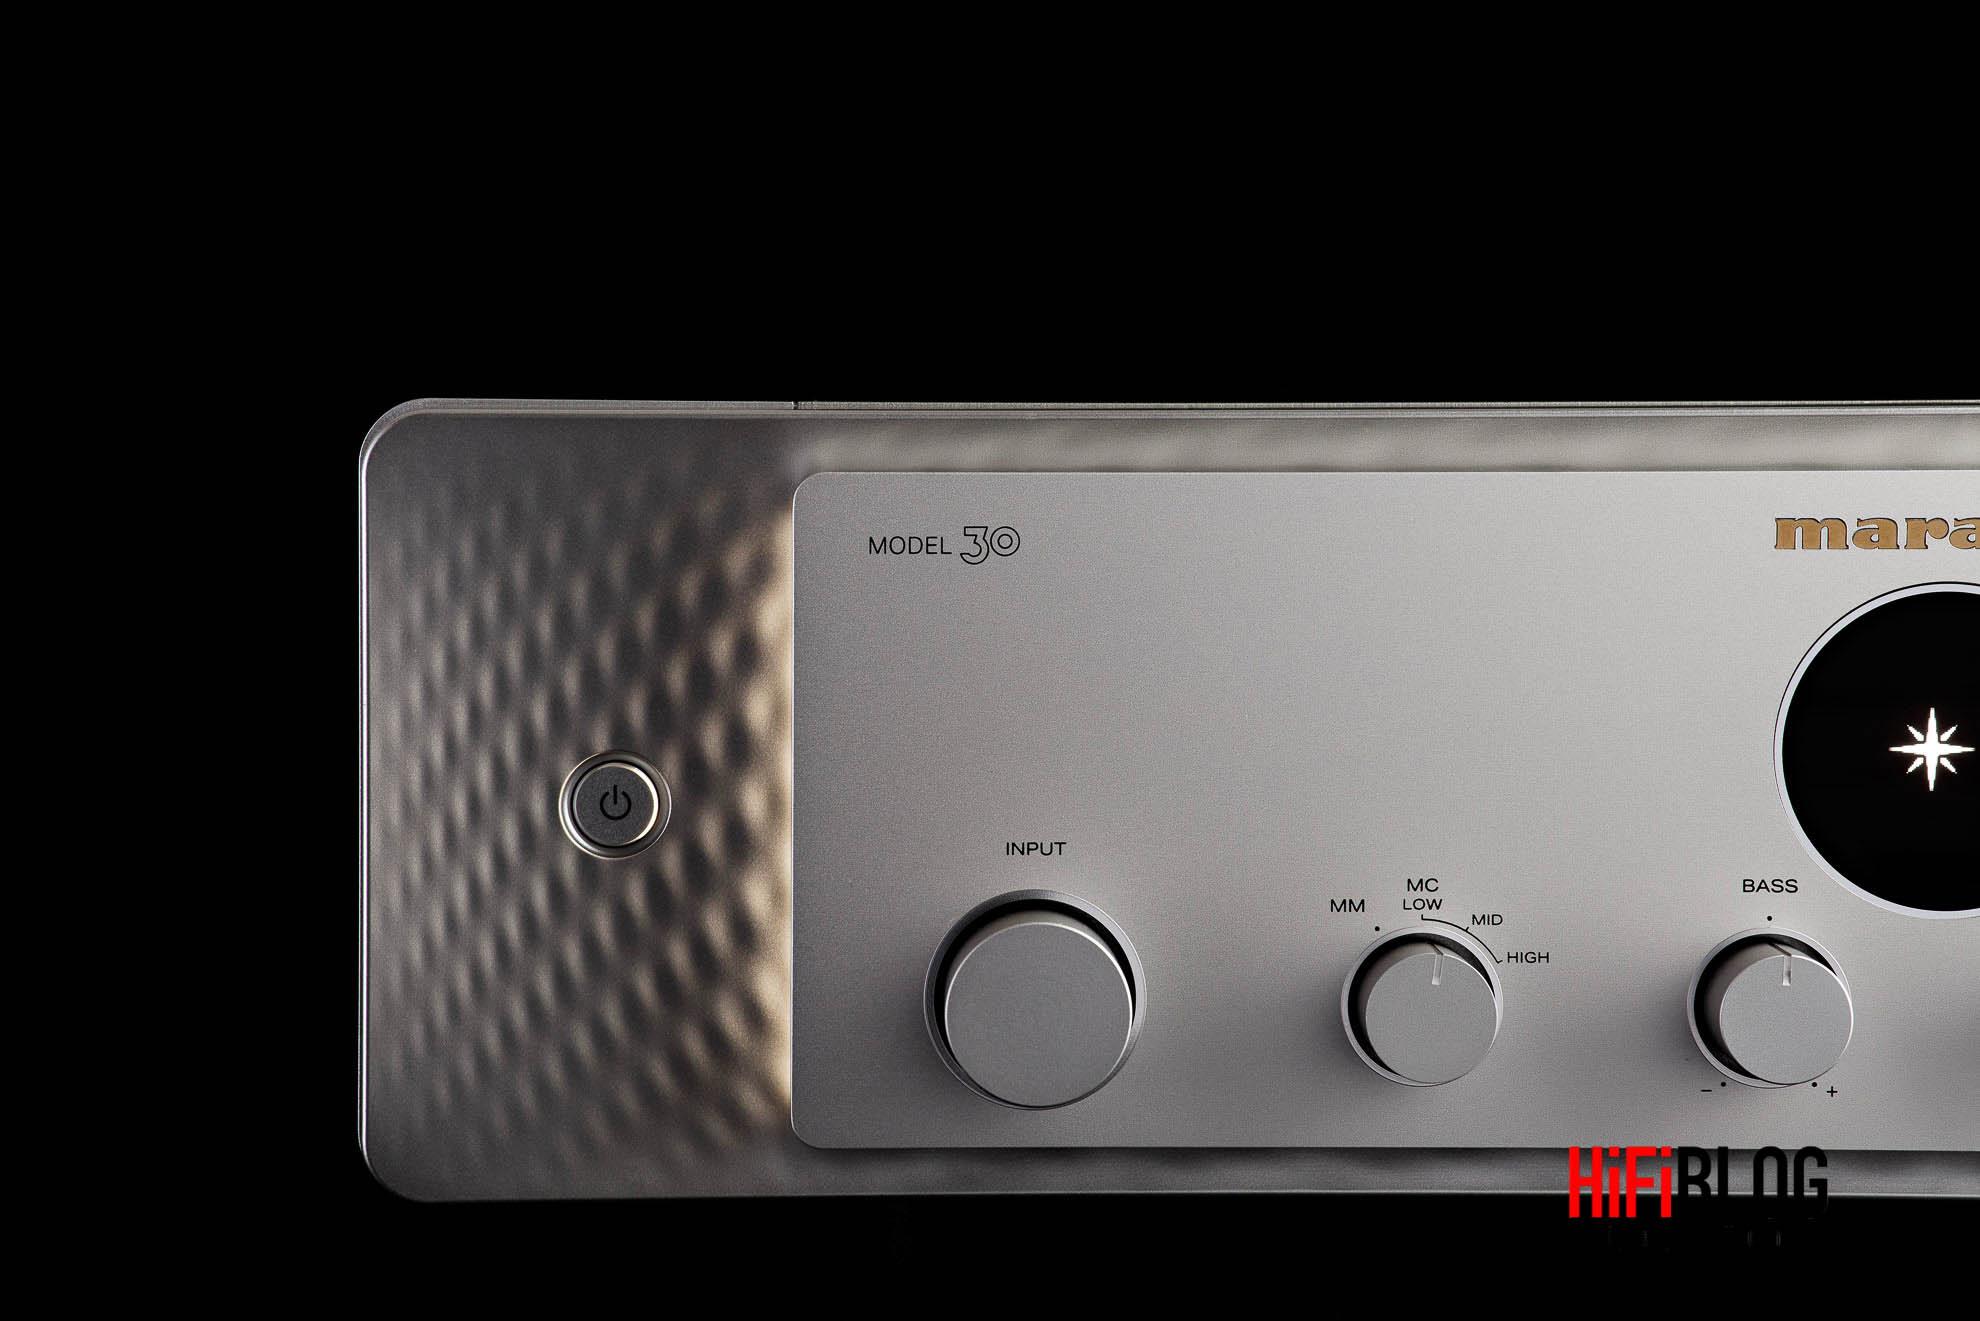 Marantz Model 30 Integrated Amplifier and SACD 30n Network SACD Player 8